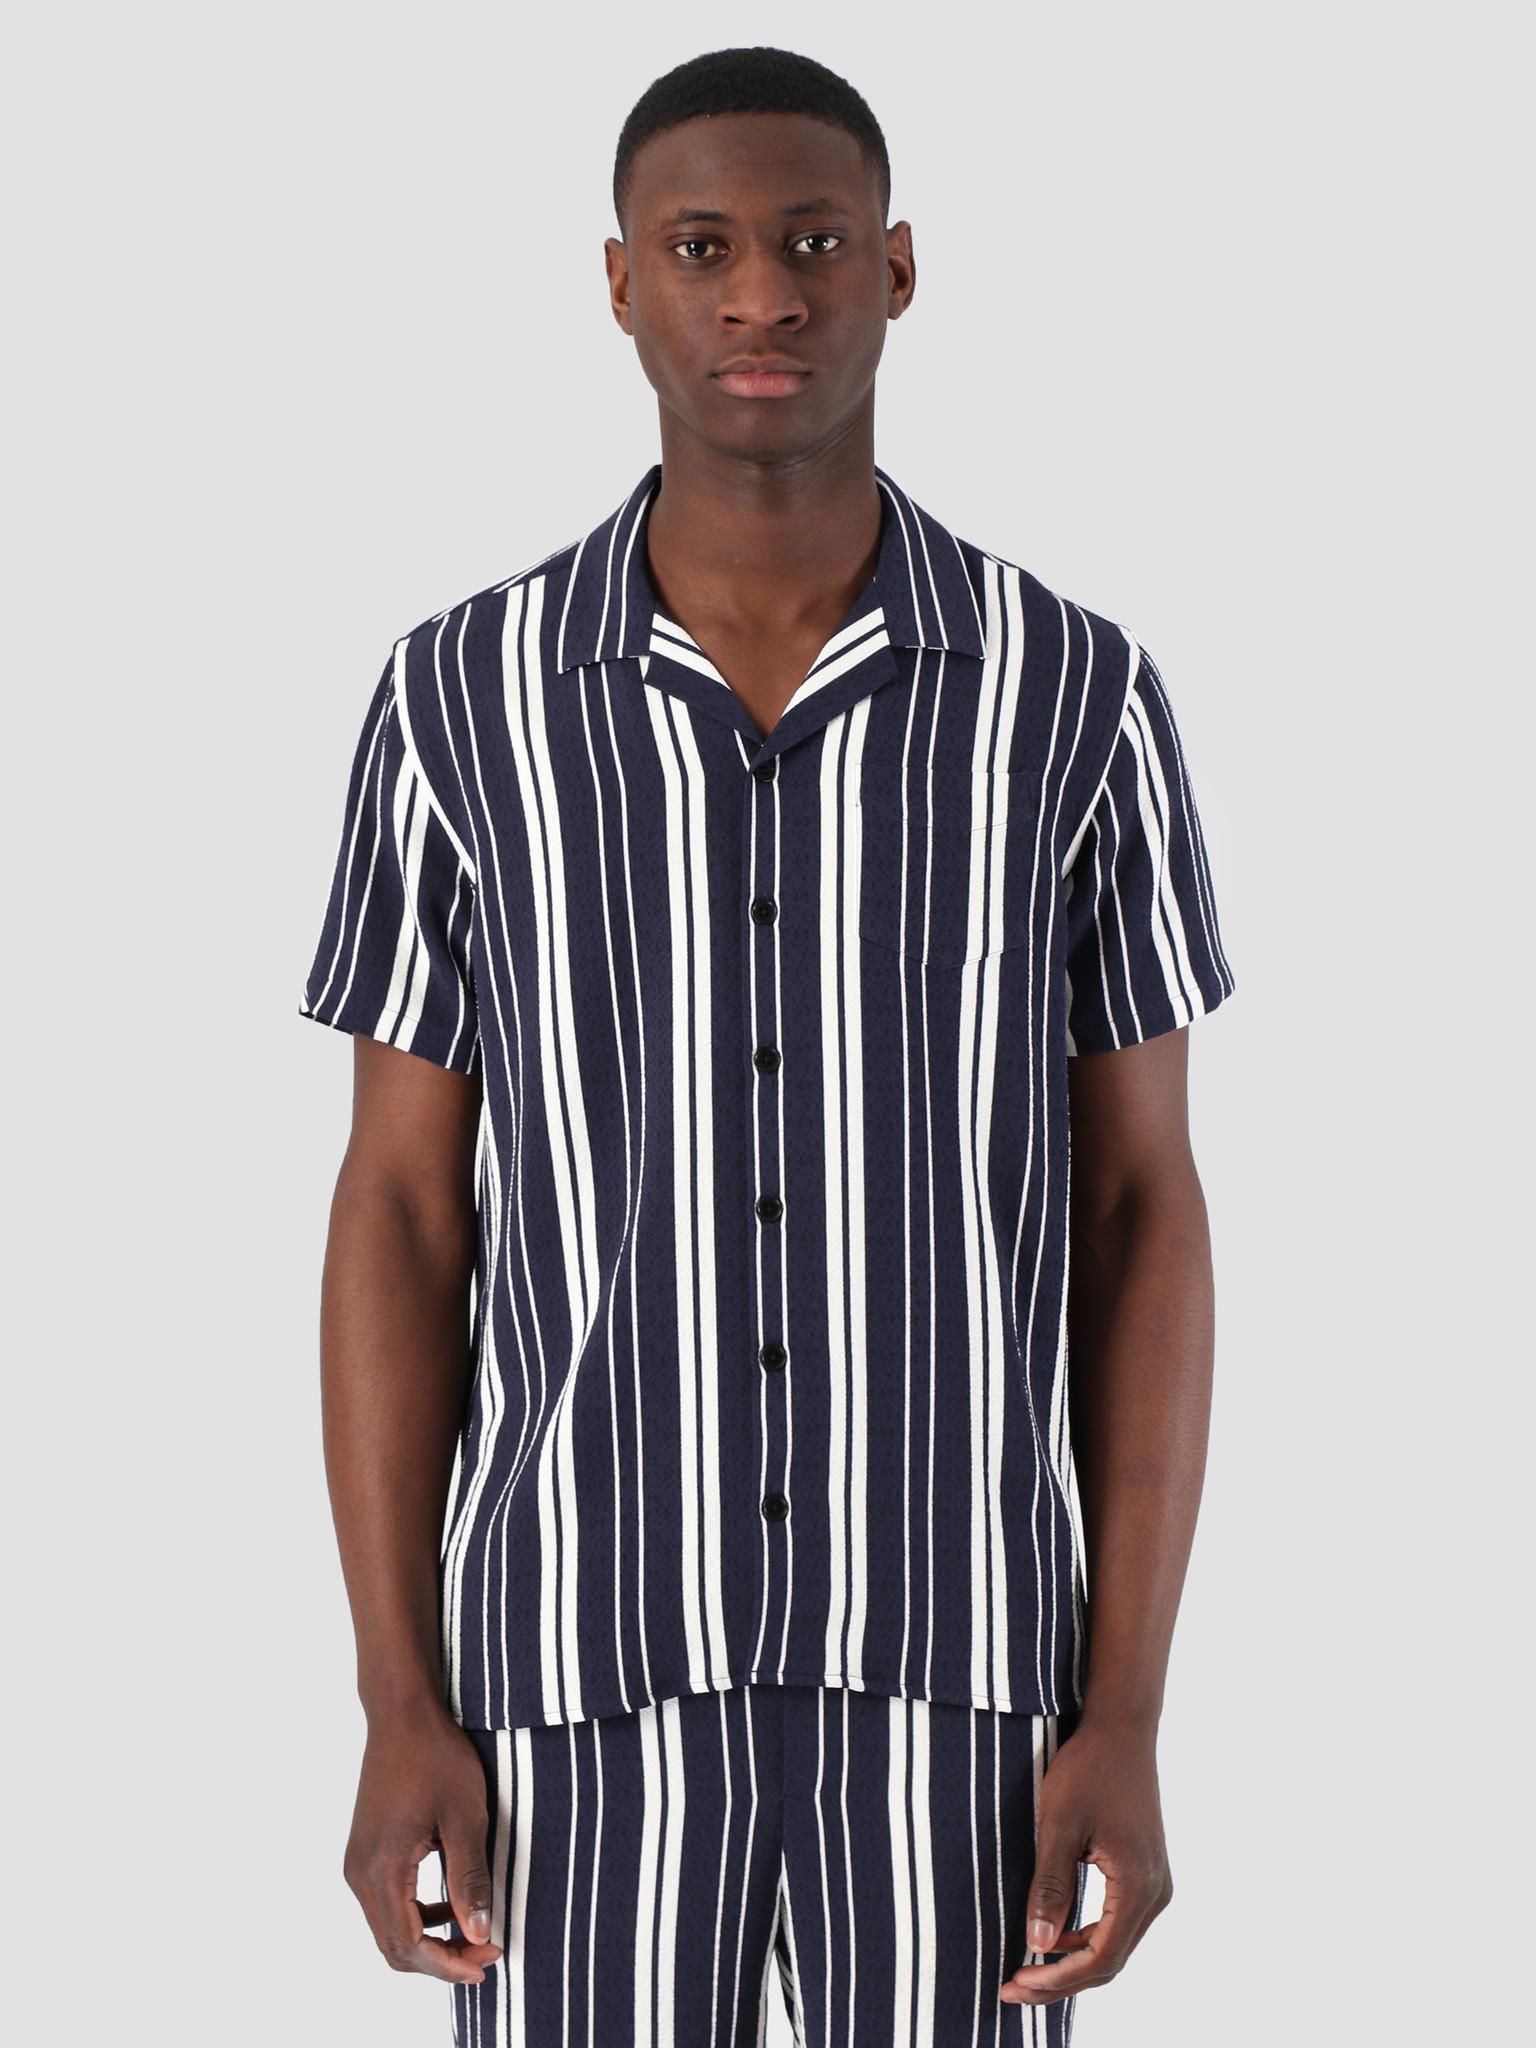 Libertine Libertine Libertine Libertine Cave Shortsleeve Shirt Off White Evening Blue 1621